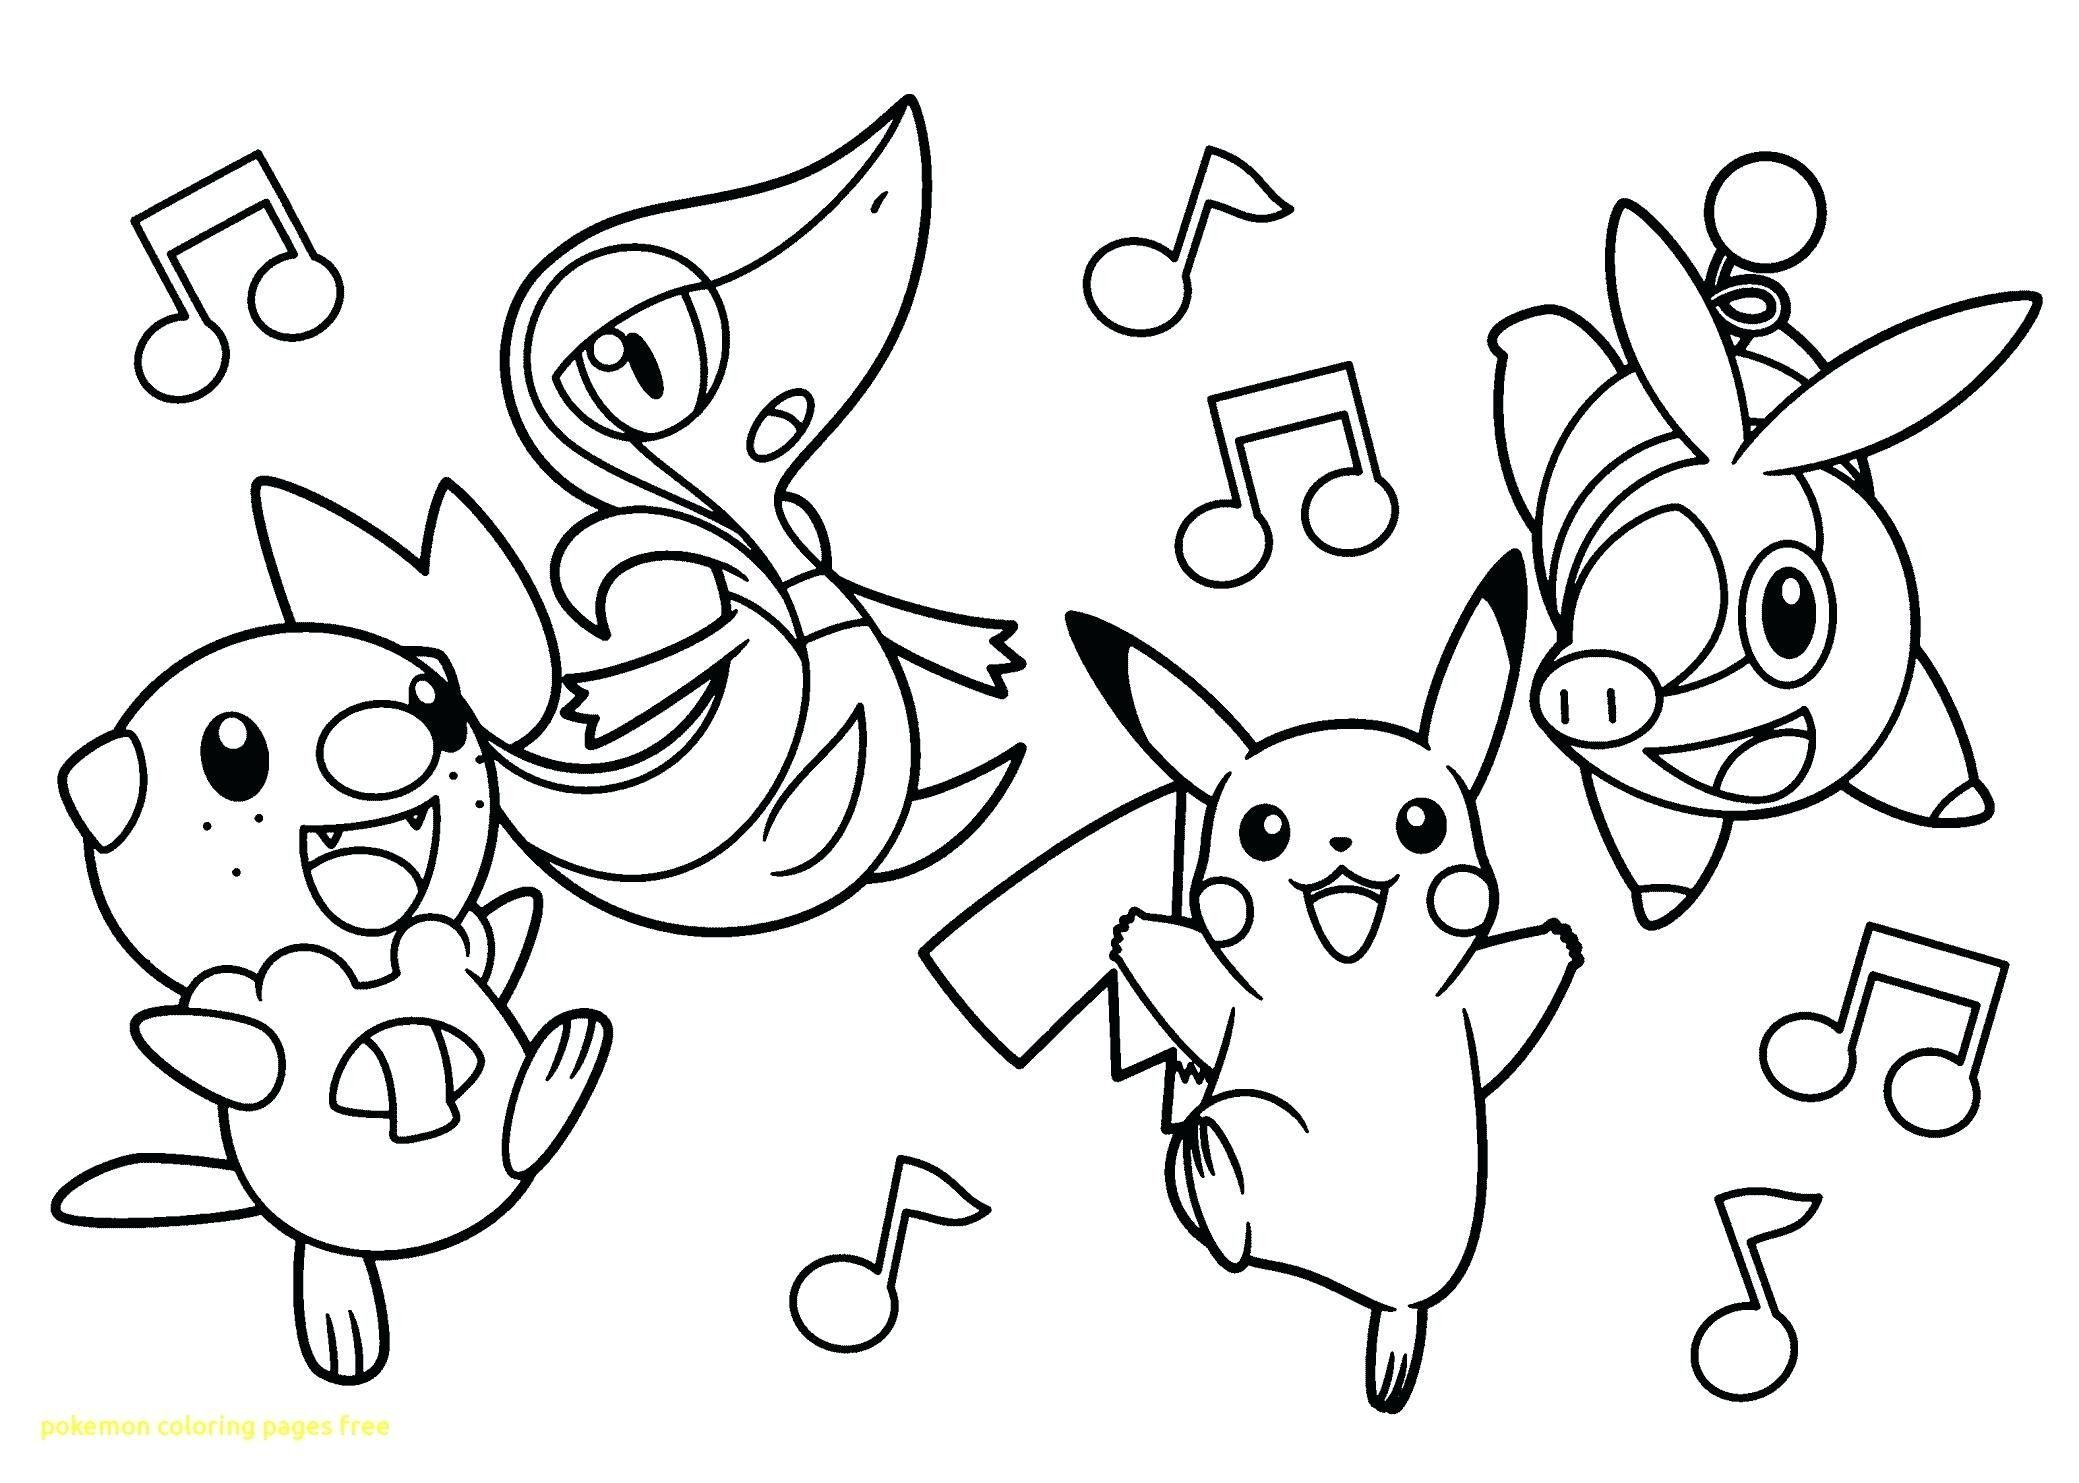 27 Inspiration Image Of Free Printable Pokemon Coloring Pages Entitlementtrap Com Pokemon Coloring Pages Cartoon Coloring Pages Anime Drawing Books